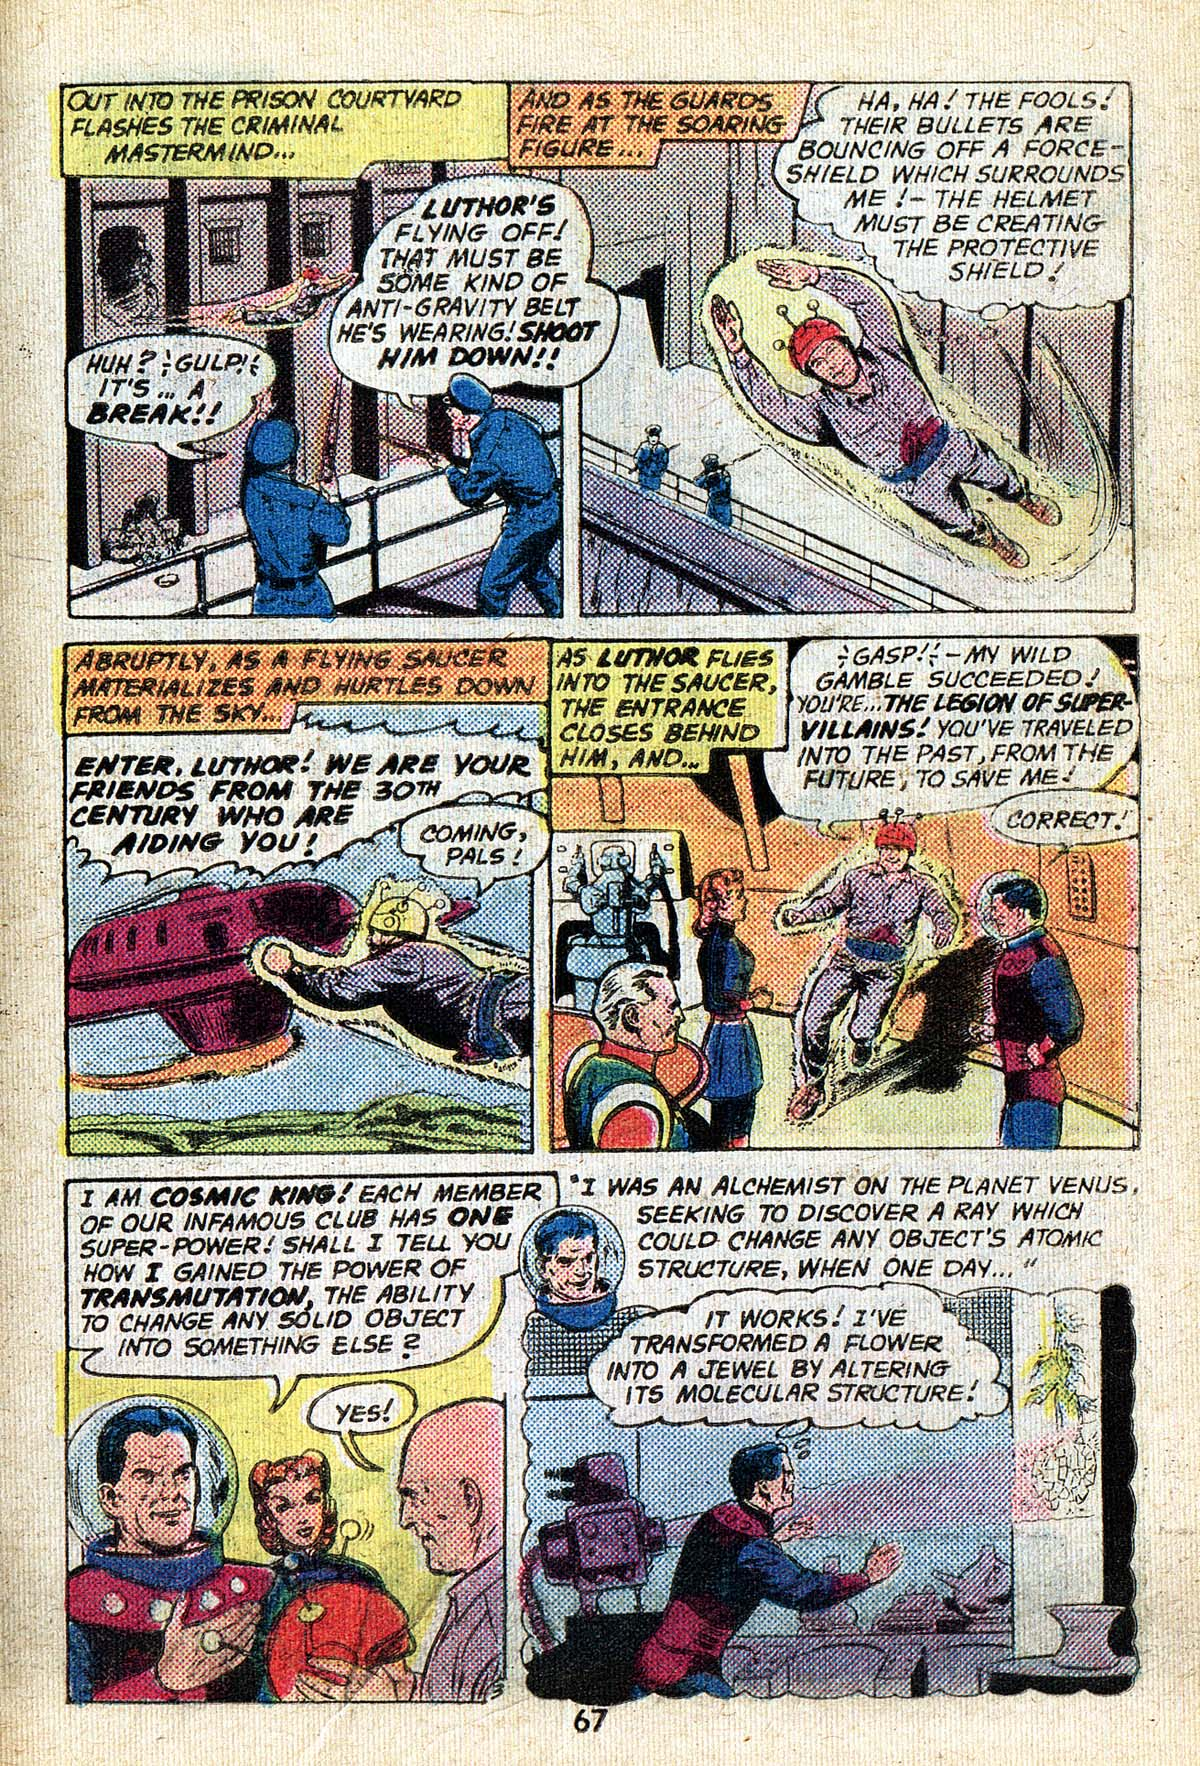 Read online Adventure Comics (1938) comic -  Issue #494 - 67